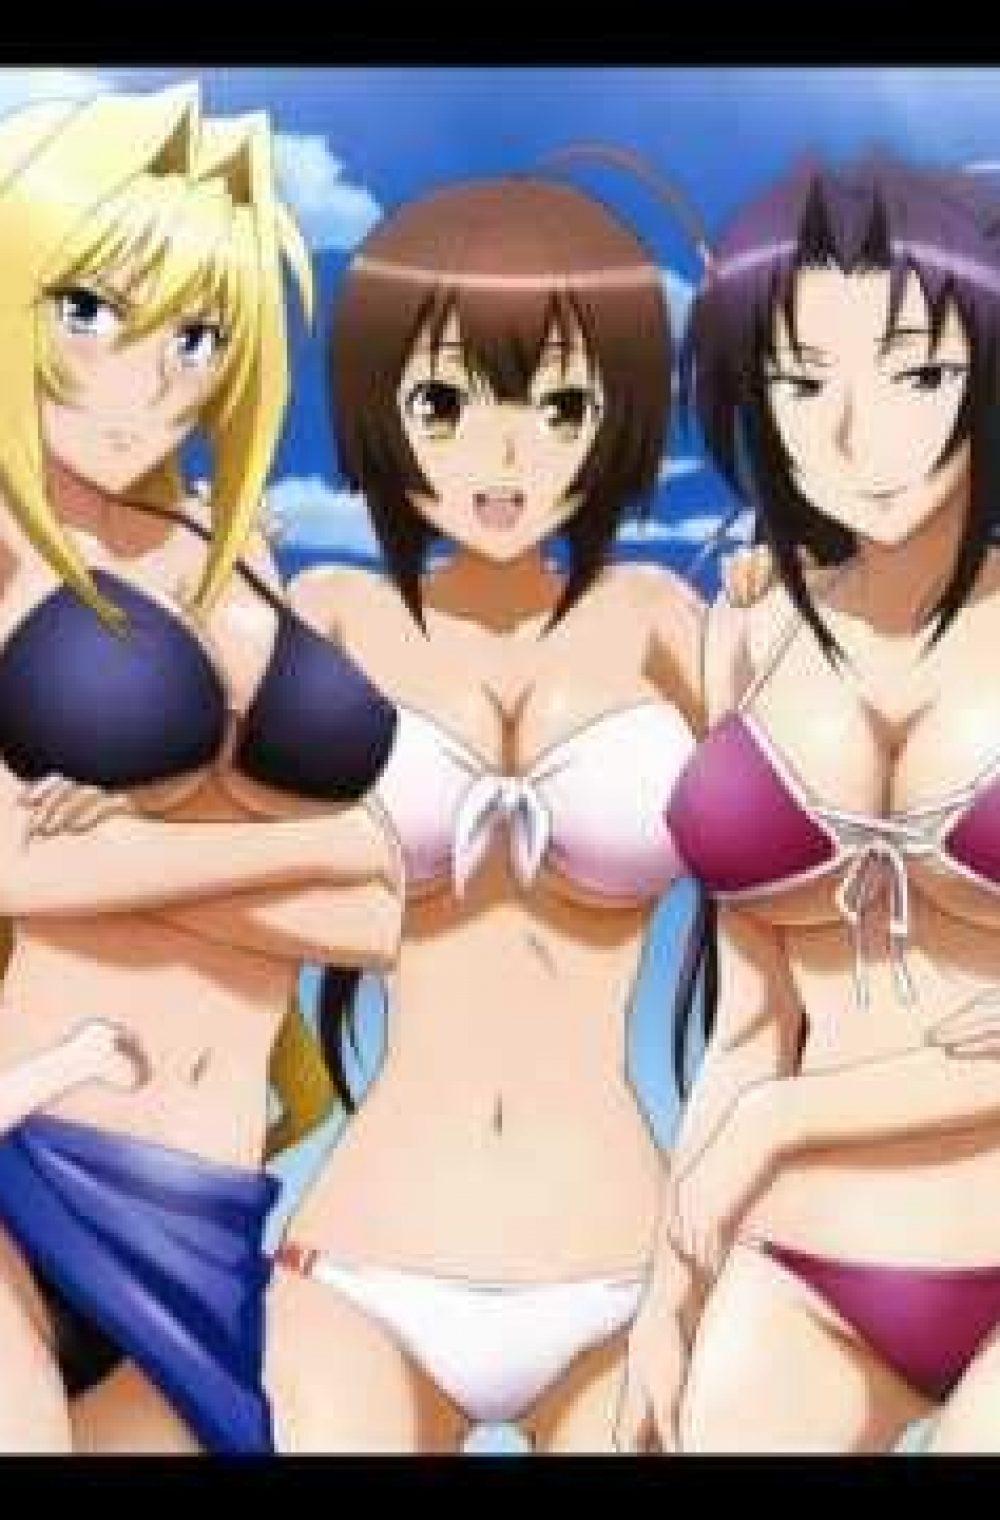 SEKIREI UNCENSORED + OVA (DUB)